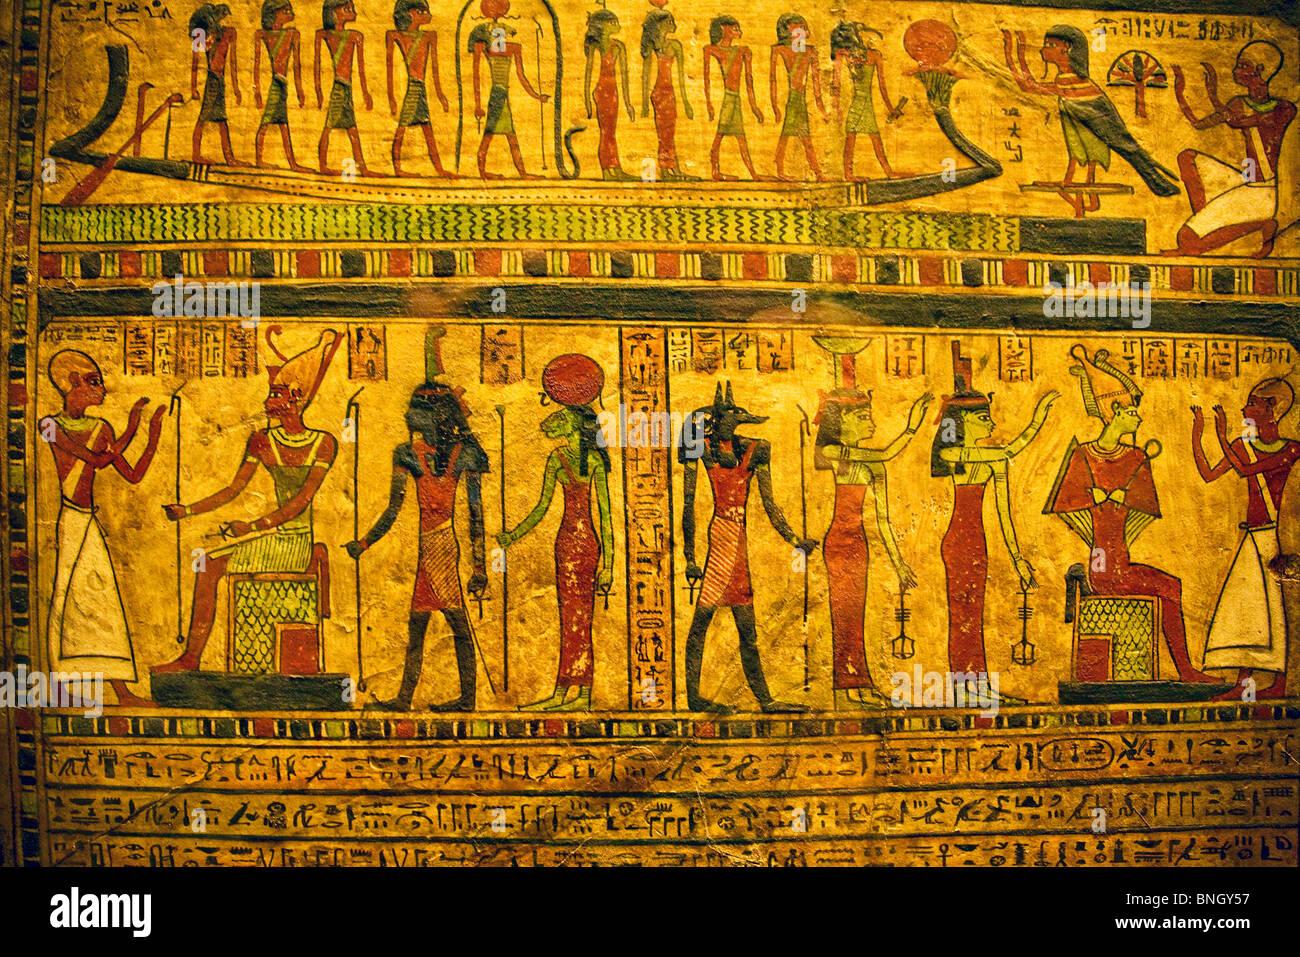 ancient egyptian gods stock photos & ancient egyptian gods stock